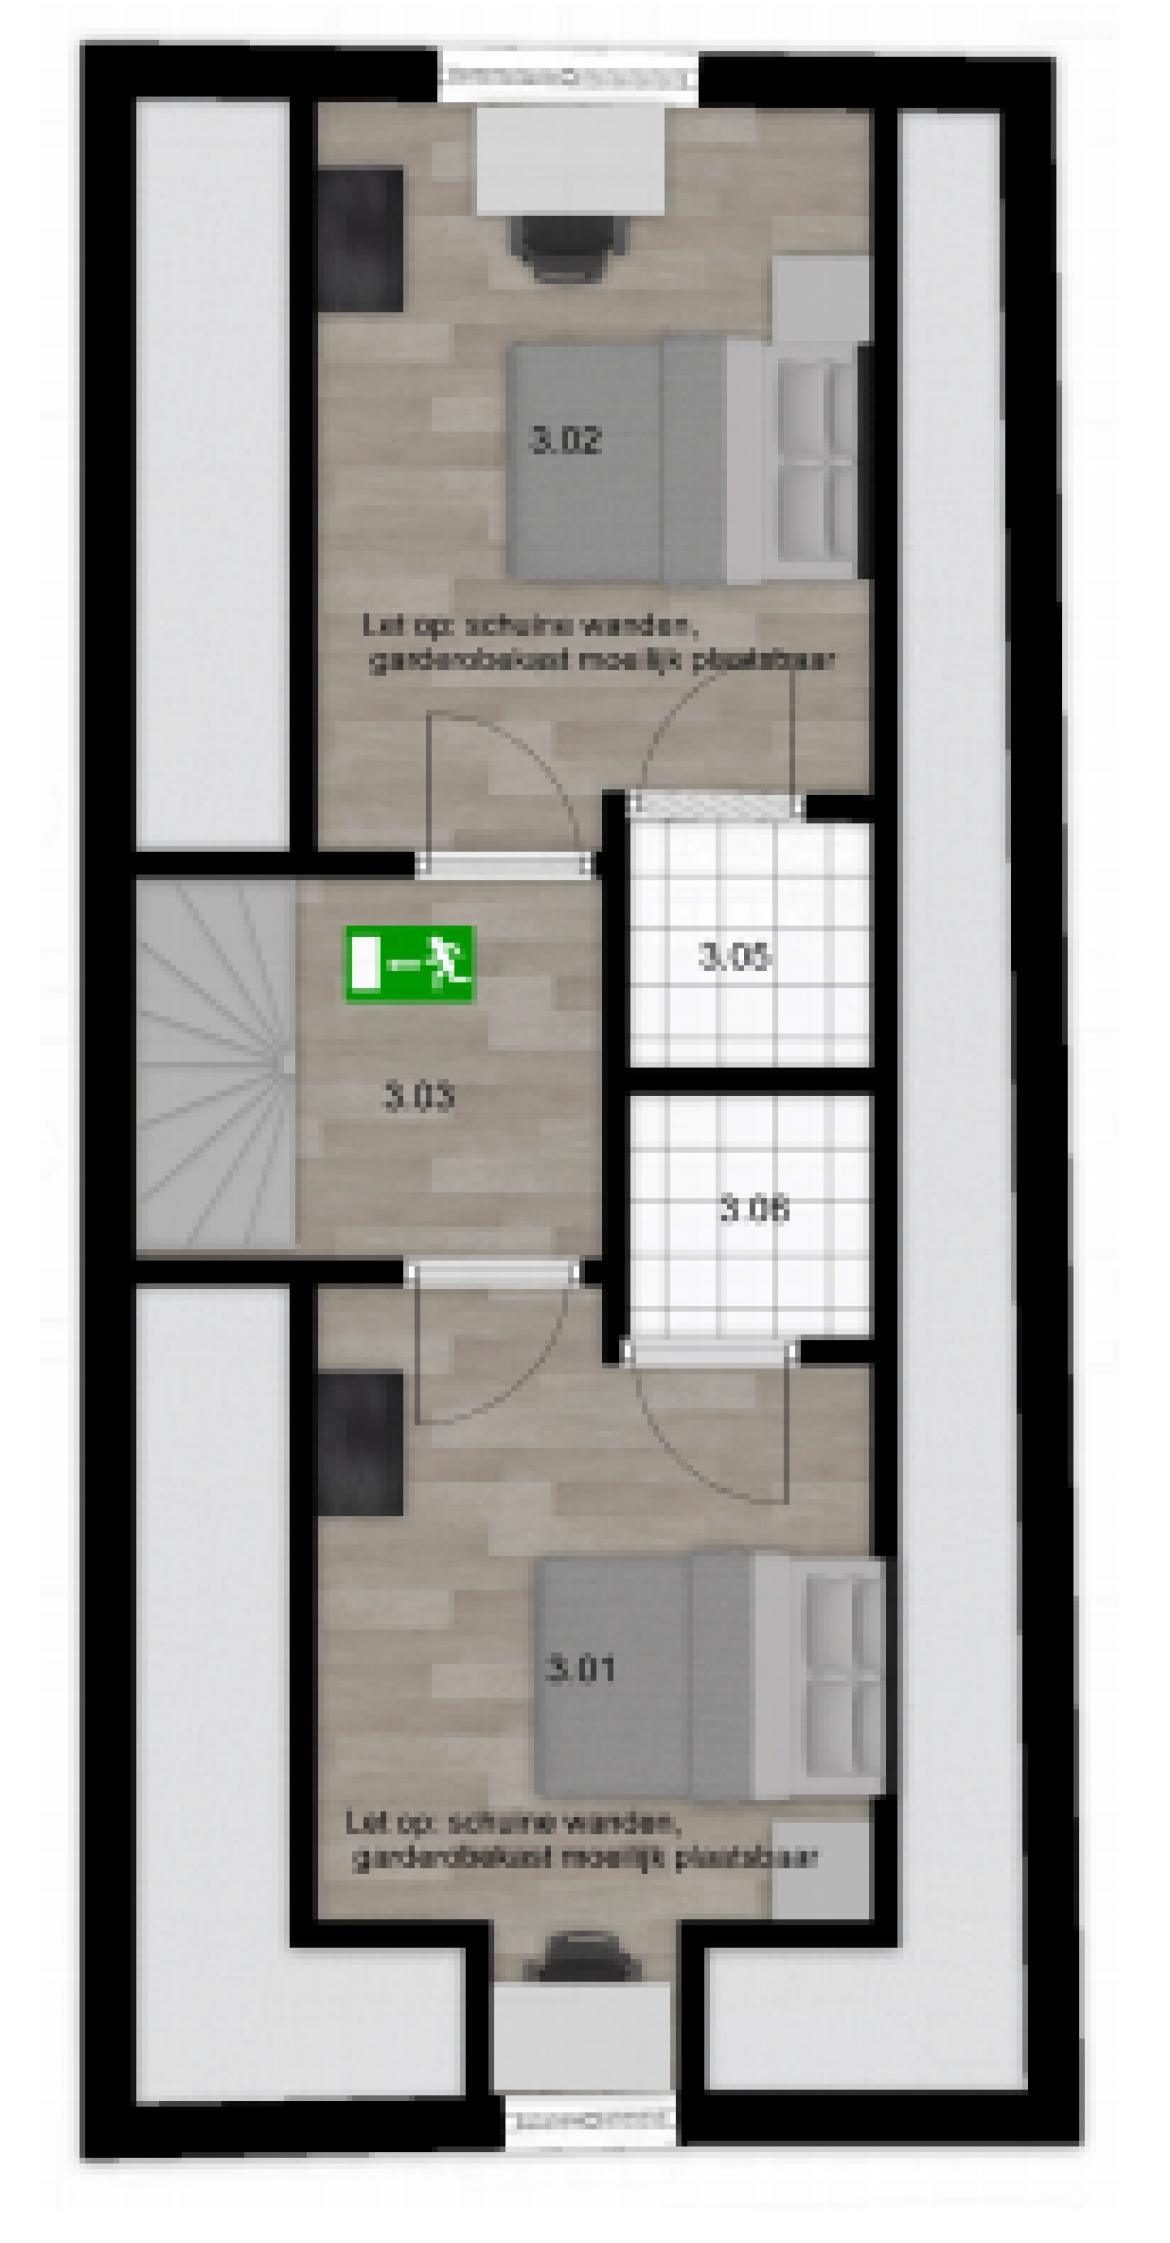 Roomplaza